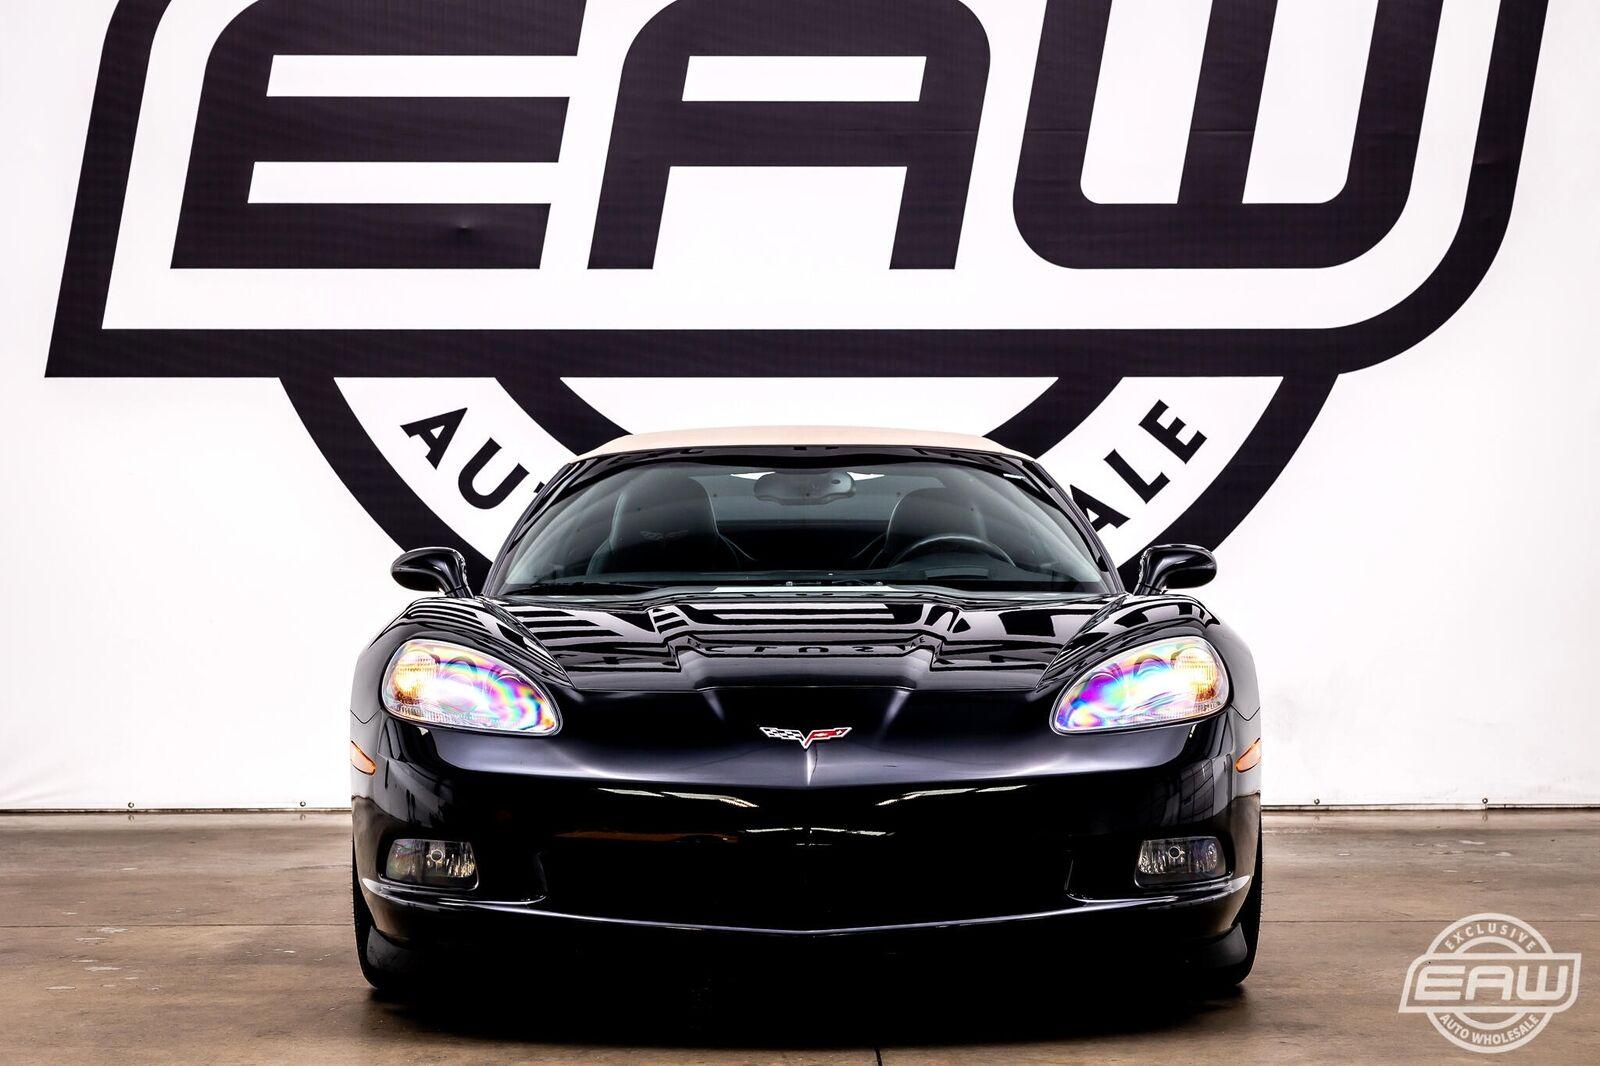 2008 Black Chevrolet Corvette Convertible  | C6 Corvette Photo 7